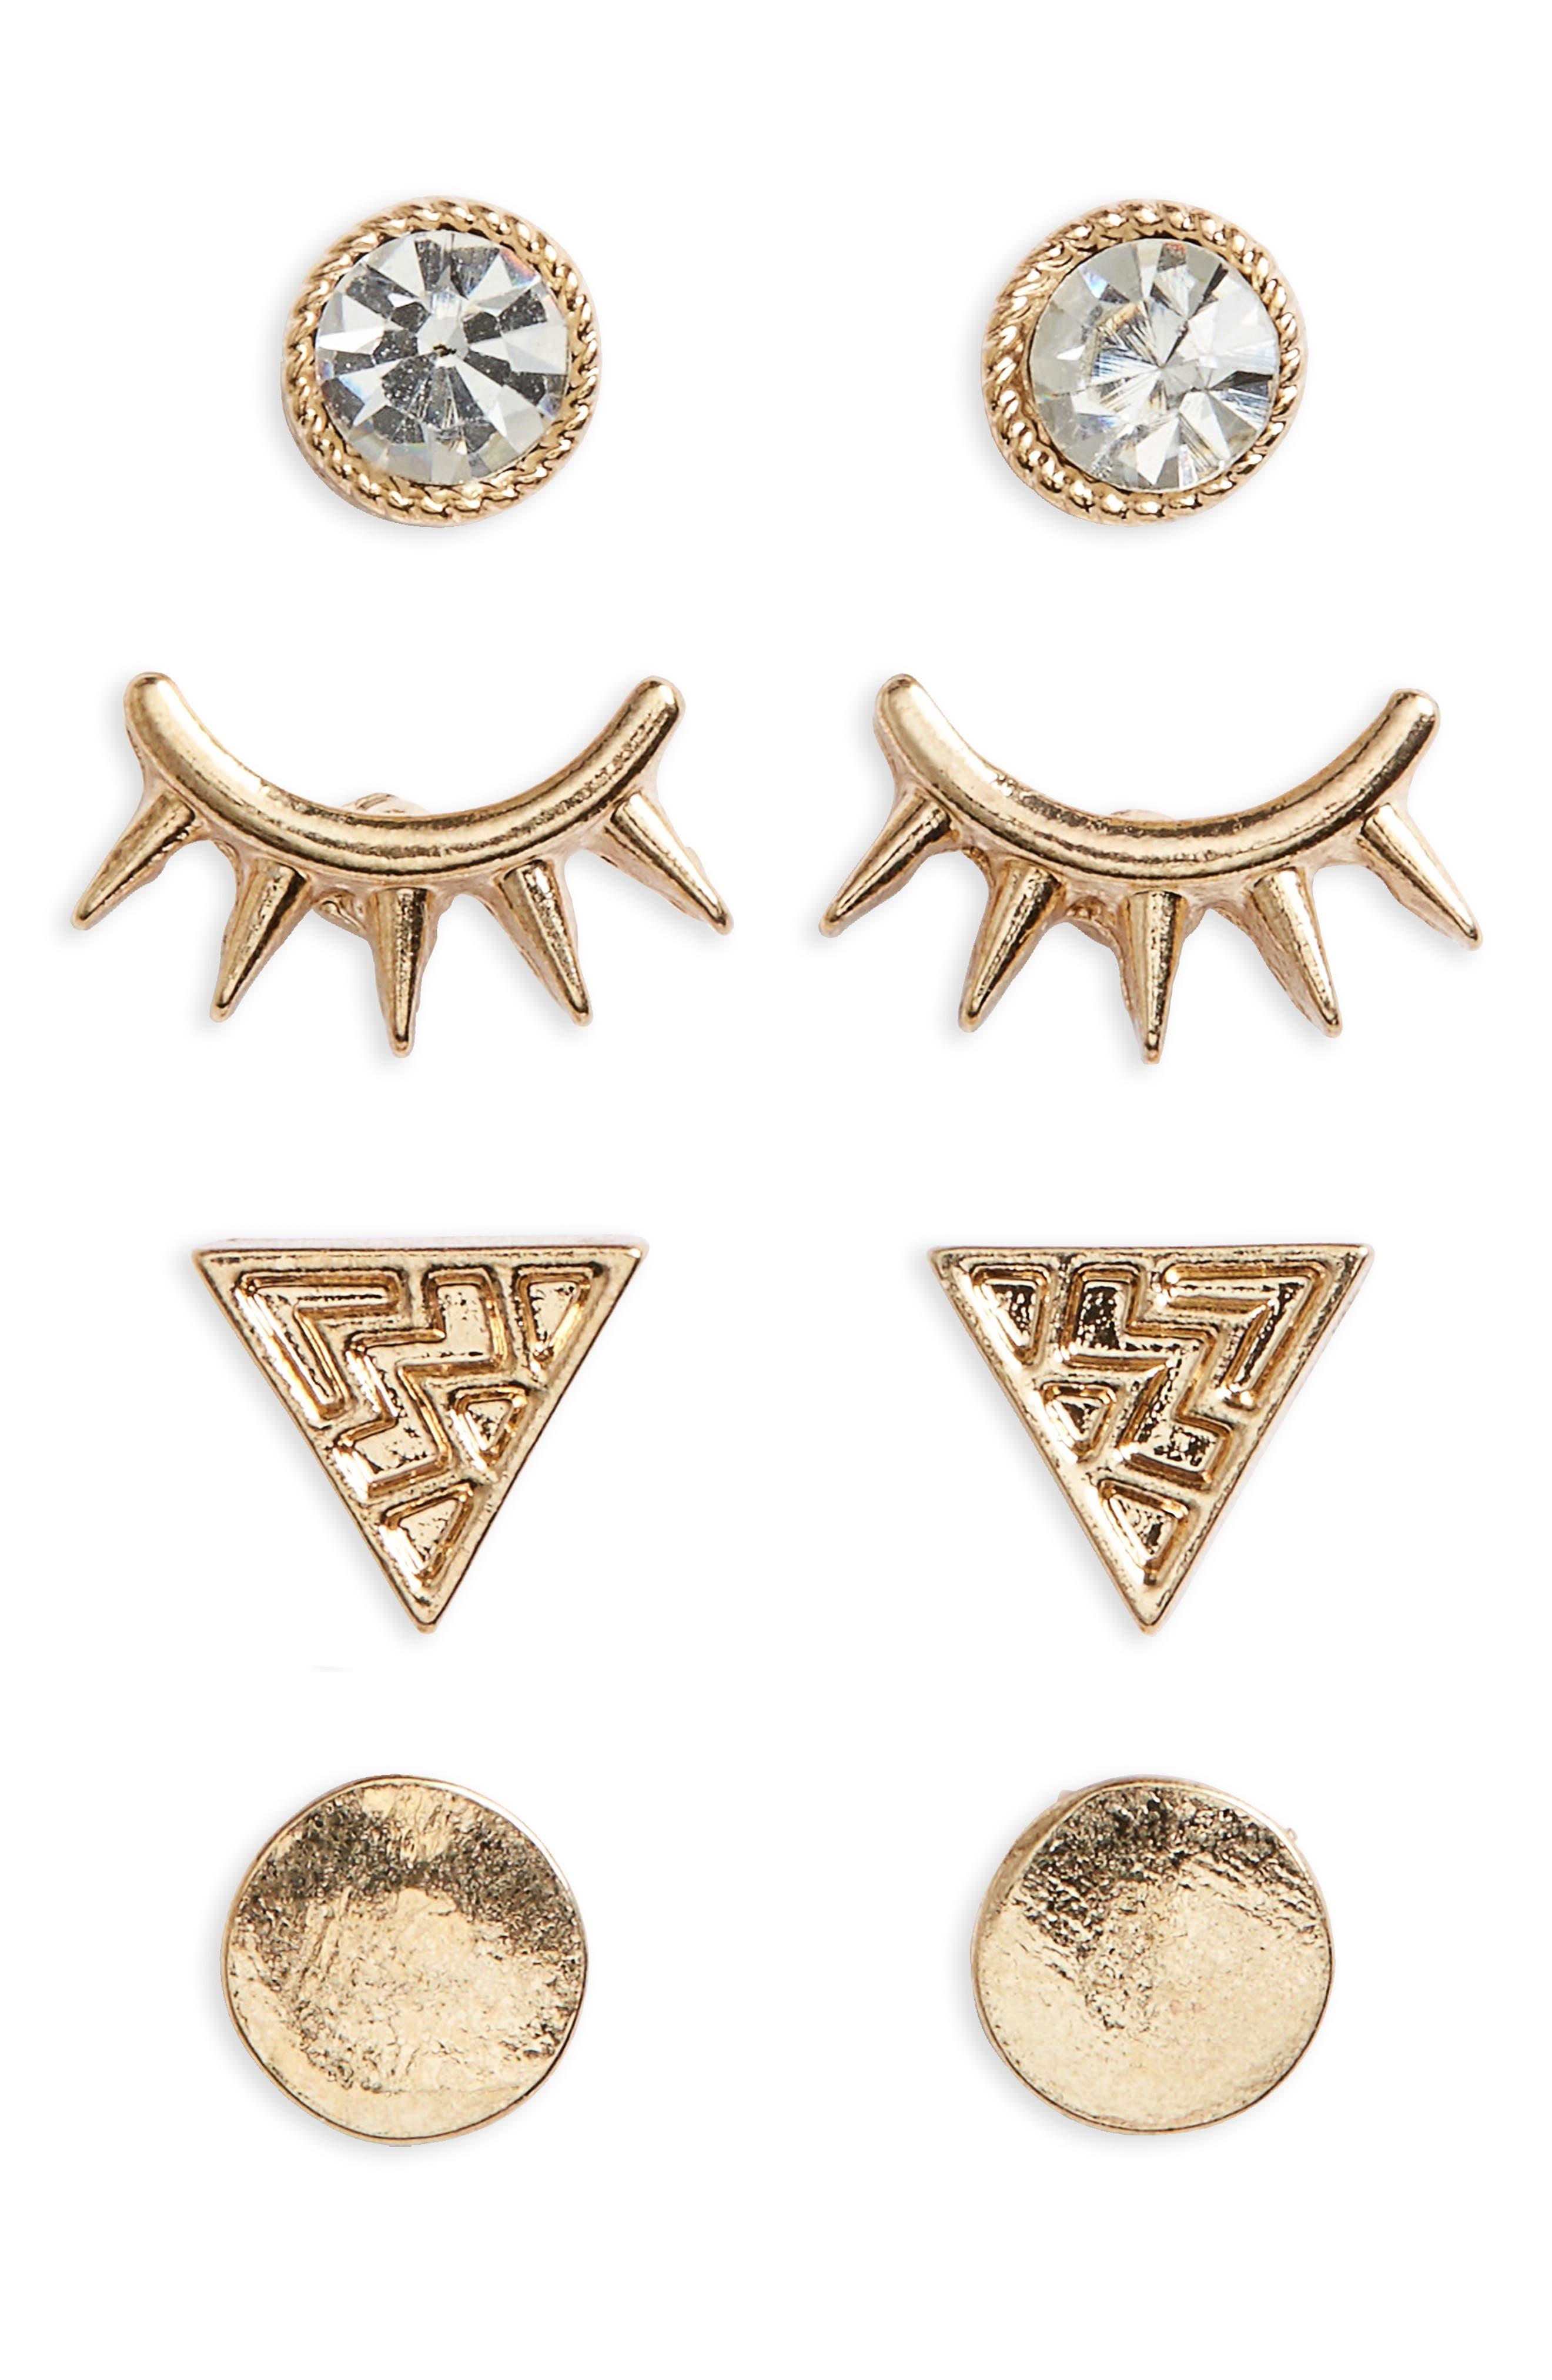 Set of 4 Stud Earrings,                             Main thumbnail 1, color,                             Gold/ Crystal